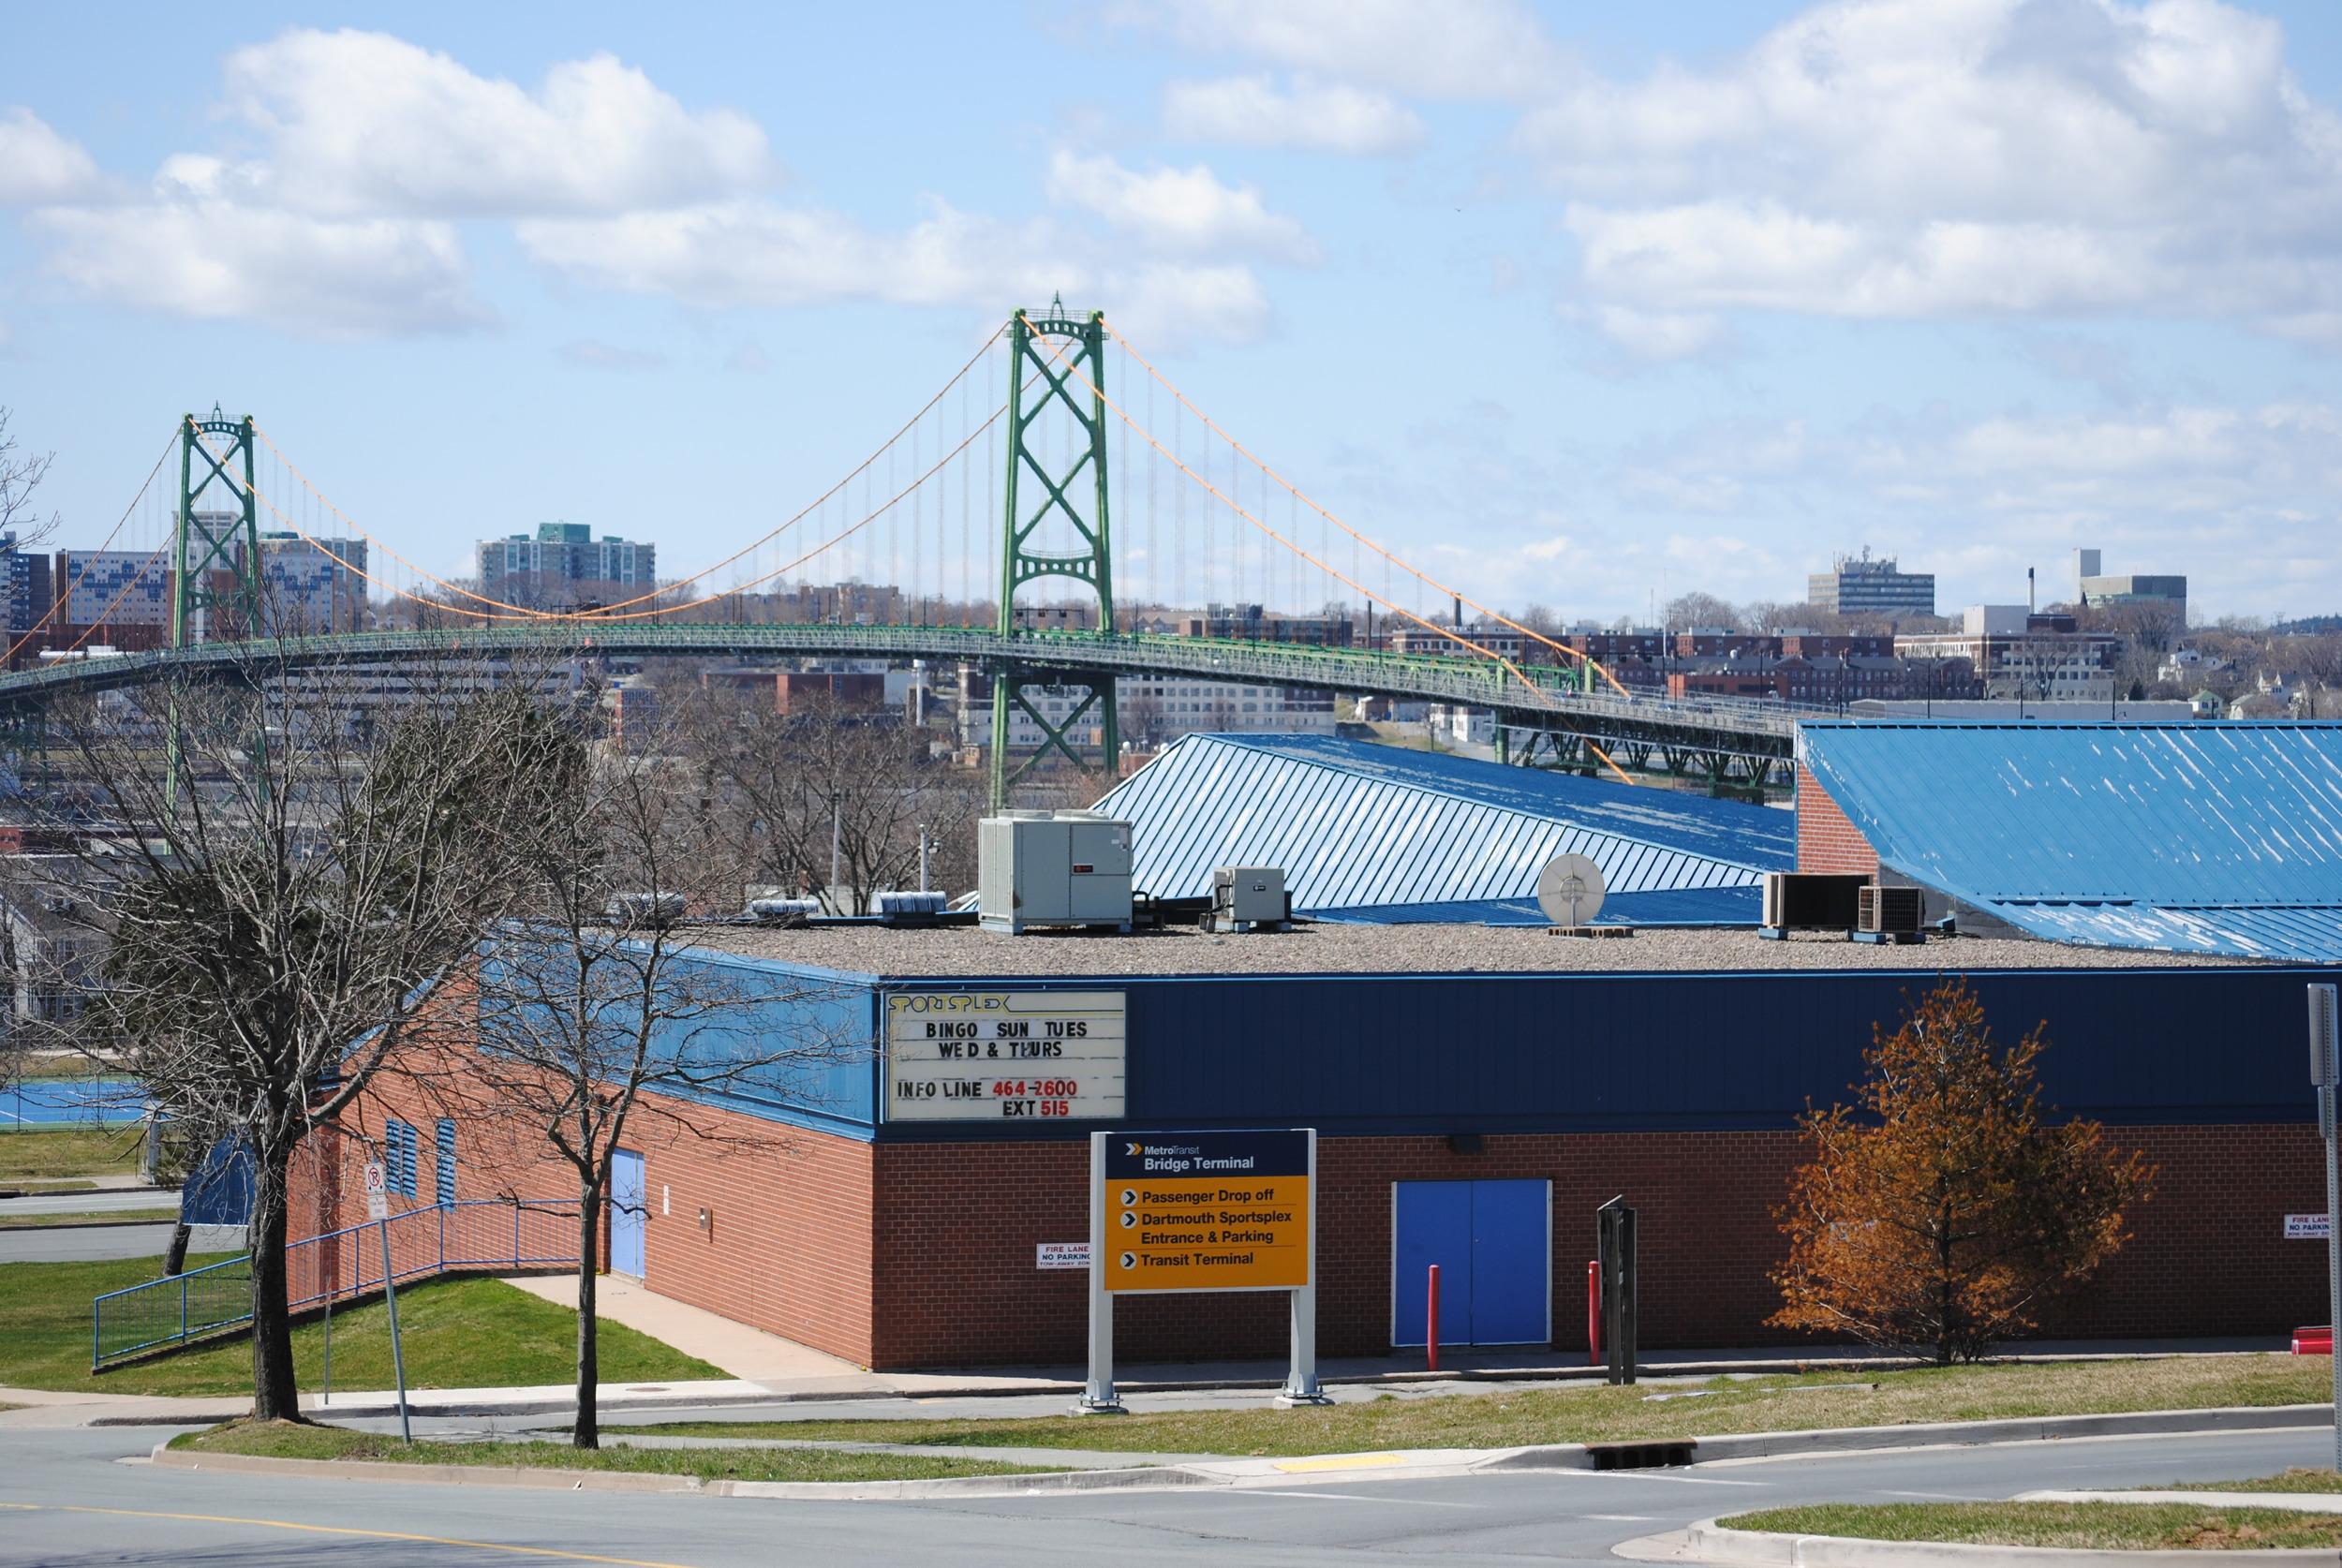 Dartmouth Sportsplex and the MacDonald Bridge from the Dartmouth Commons Area